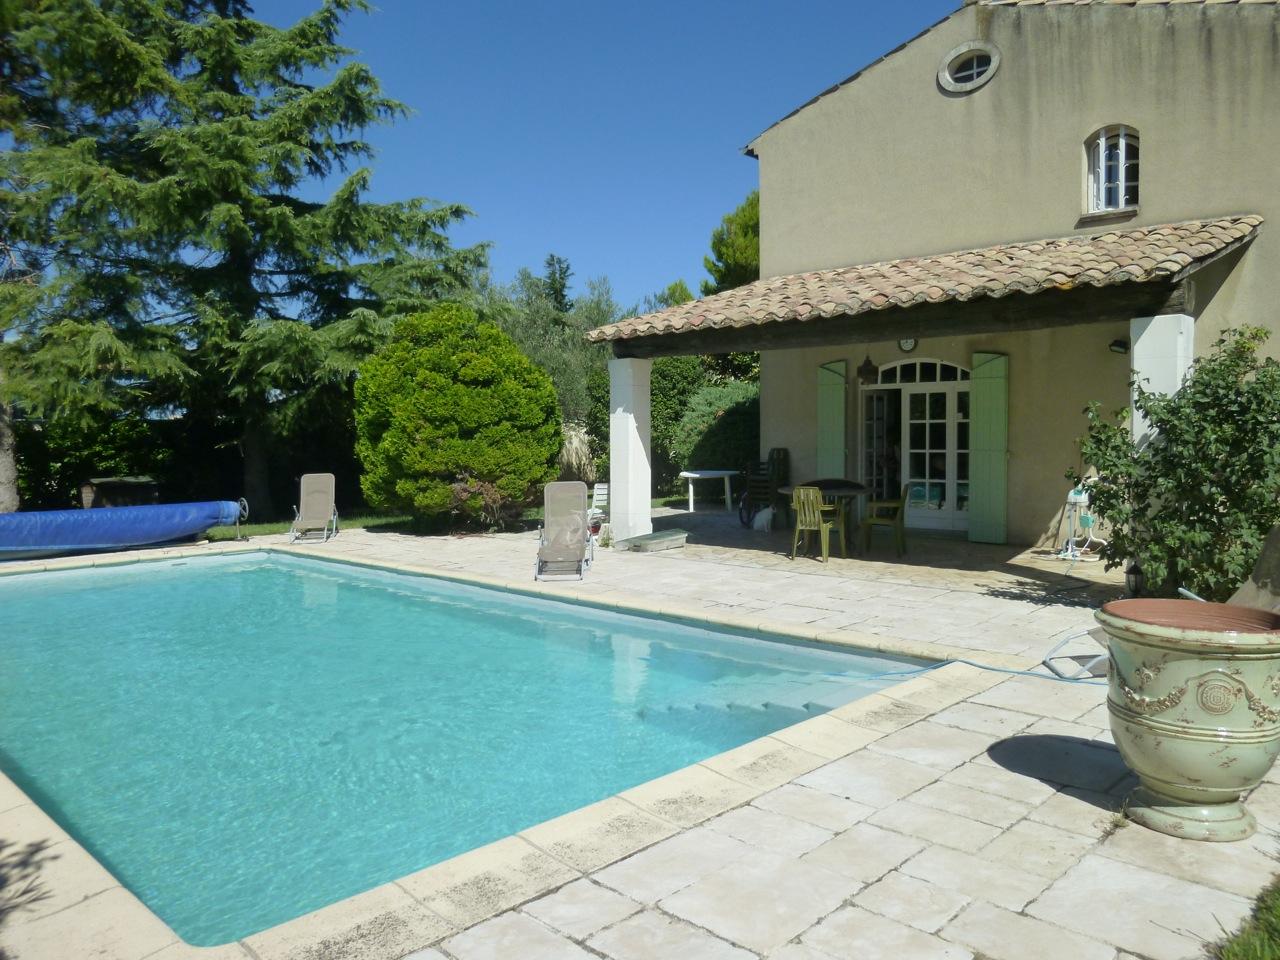 Design piscine pierrelatte boulogne billancourt 27 - Piscine municipale quebec boulogne billancourt ...